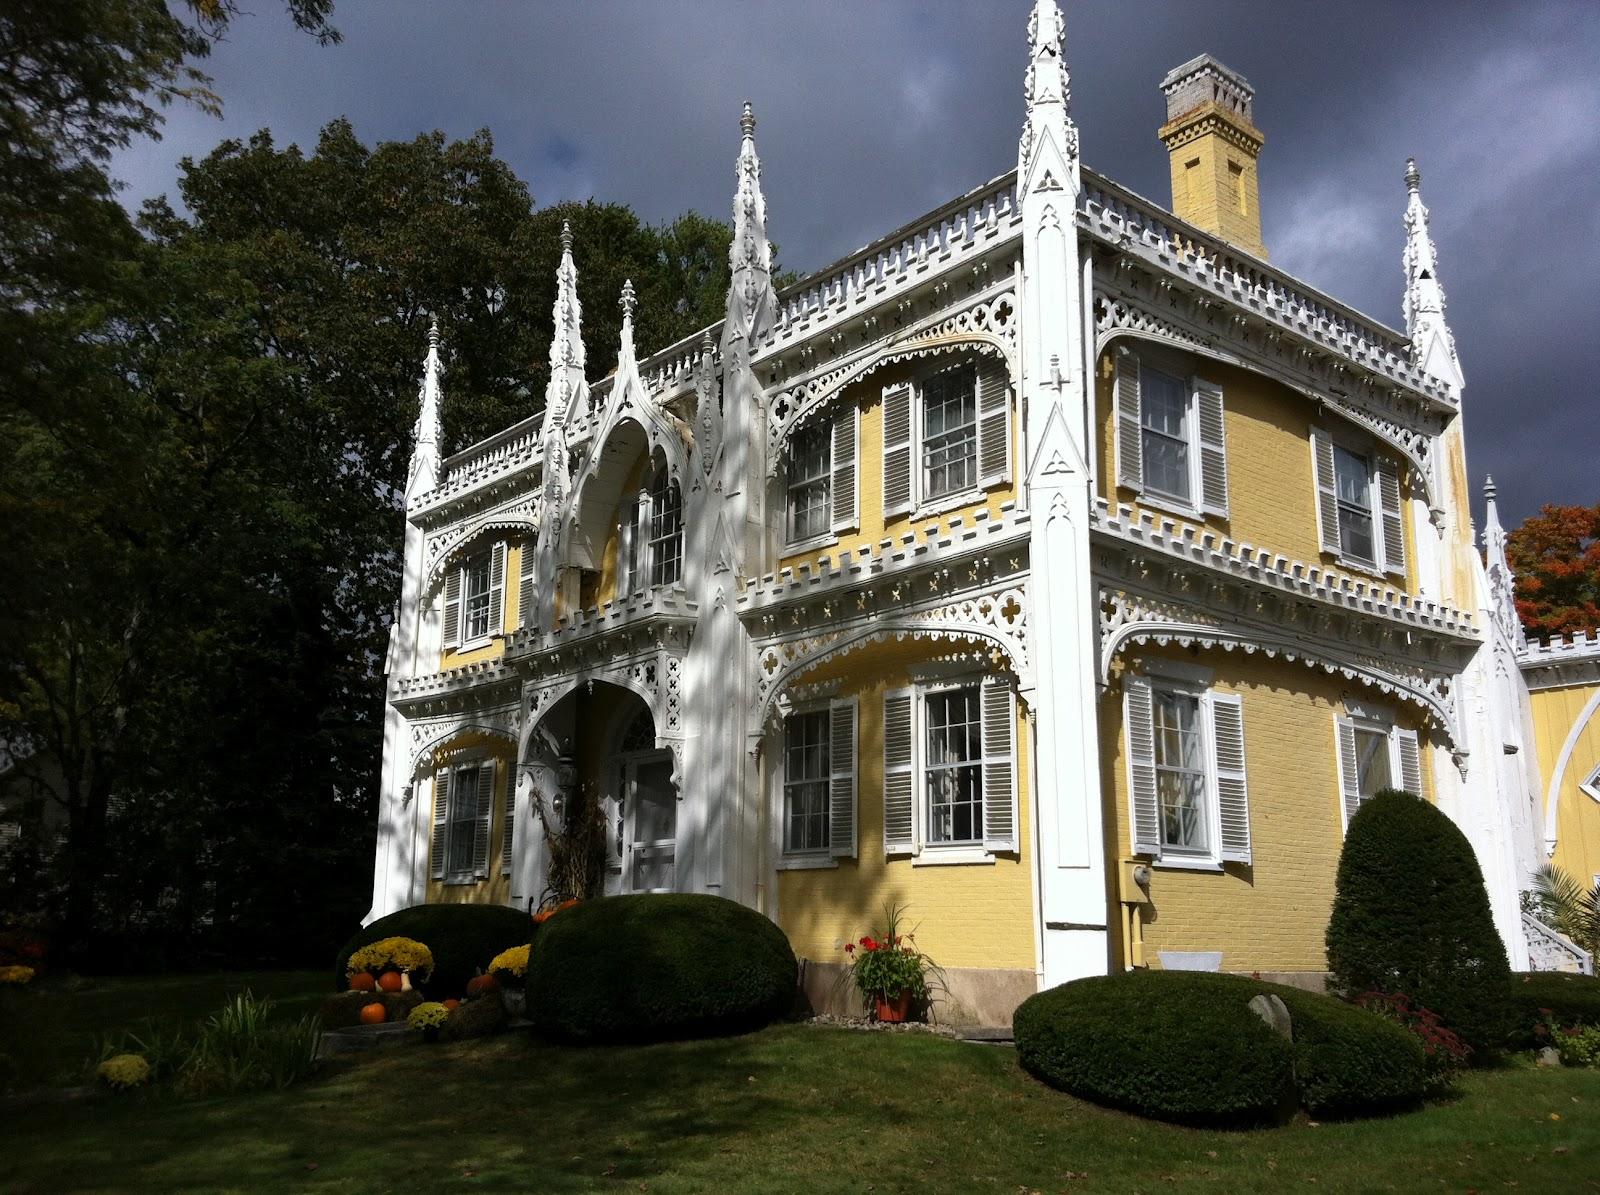 Wedding Cake House Of Kennebunk Ancestryink